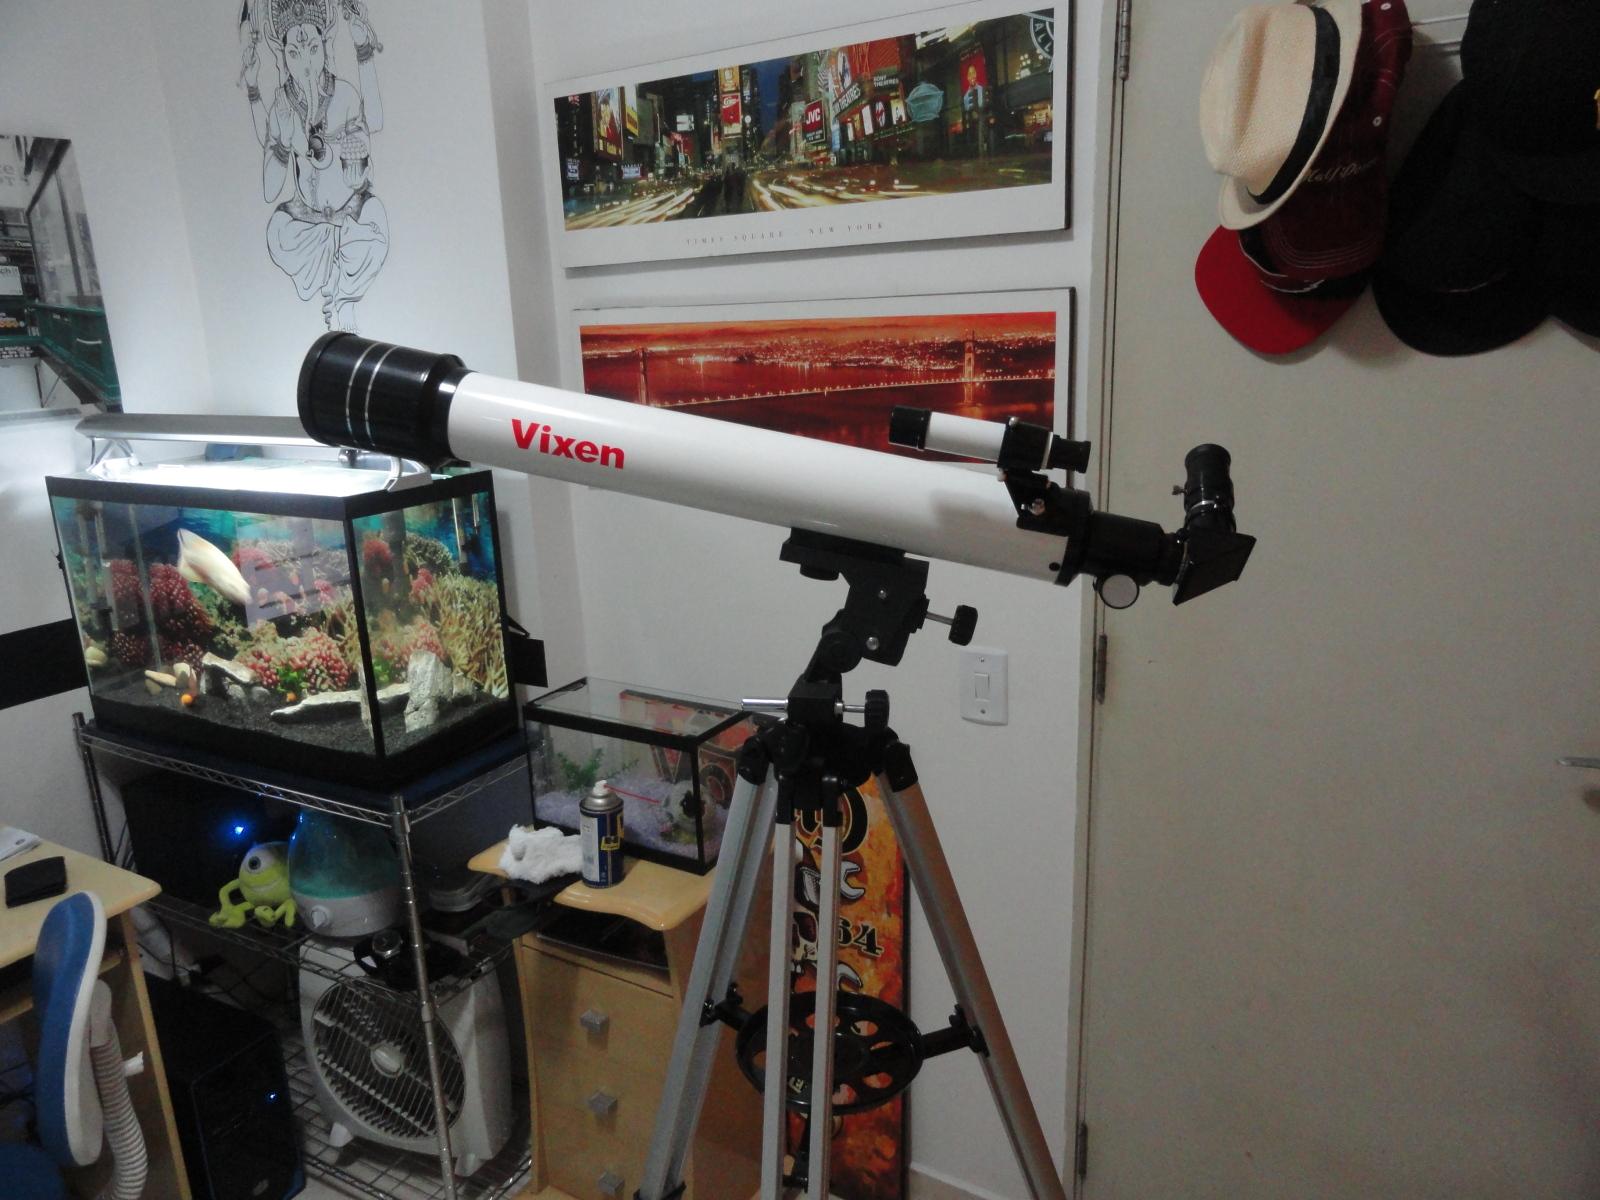 VENDO - Telescópio Refrator Vixen 70mm F/d 10 + Ocular 2x Barlow Gso 2gy2ekh